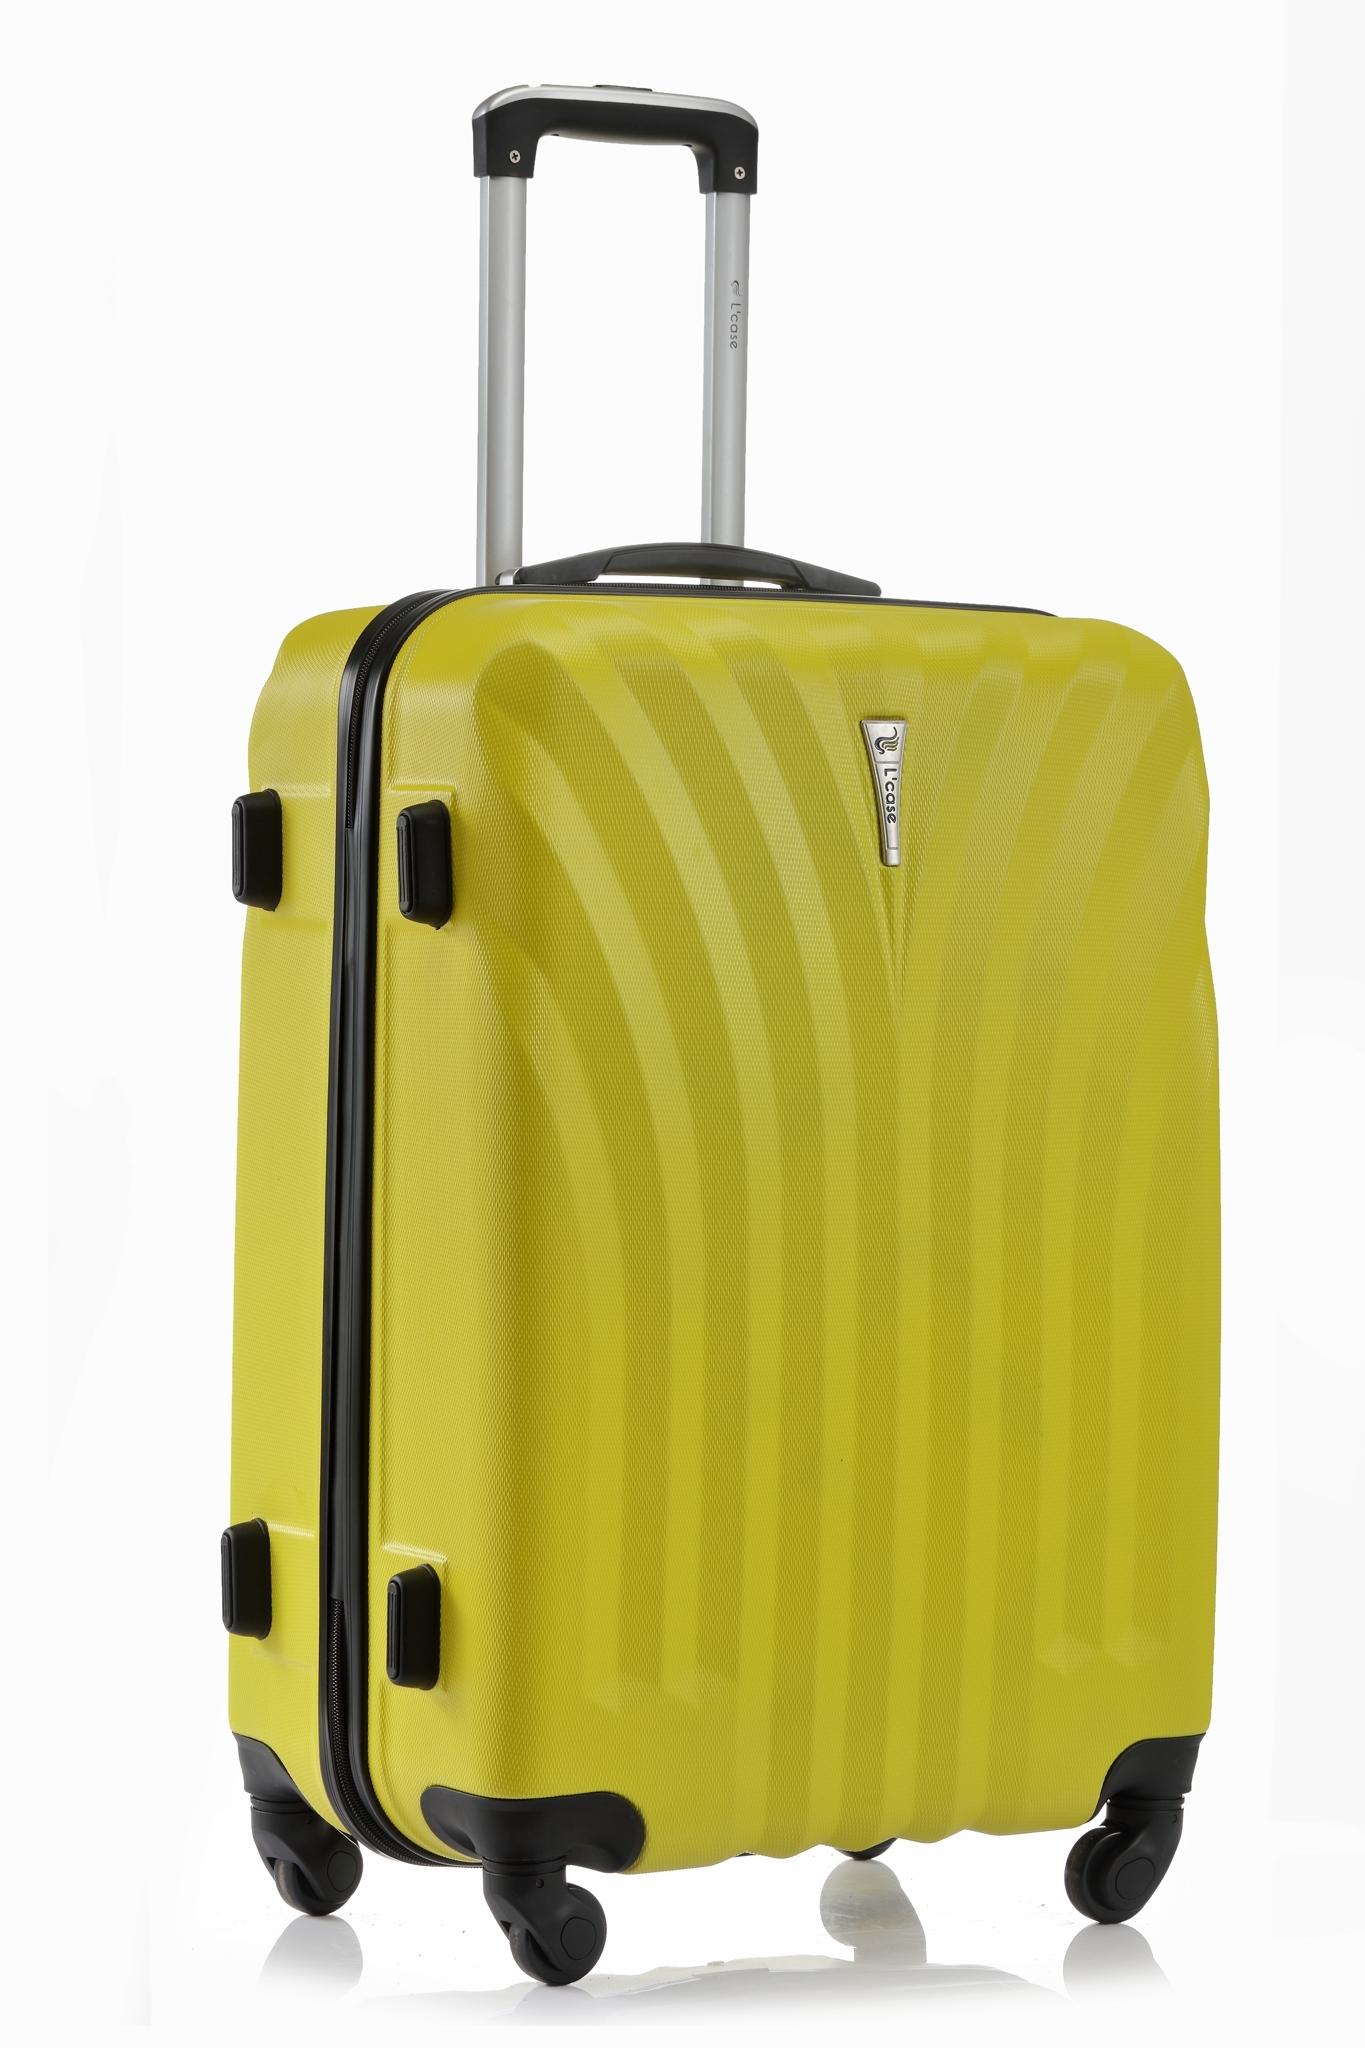 Чемодан со съемными колесами L'case Phuket-20 Желтый (S+)